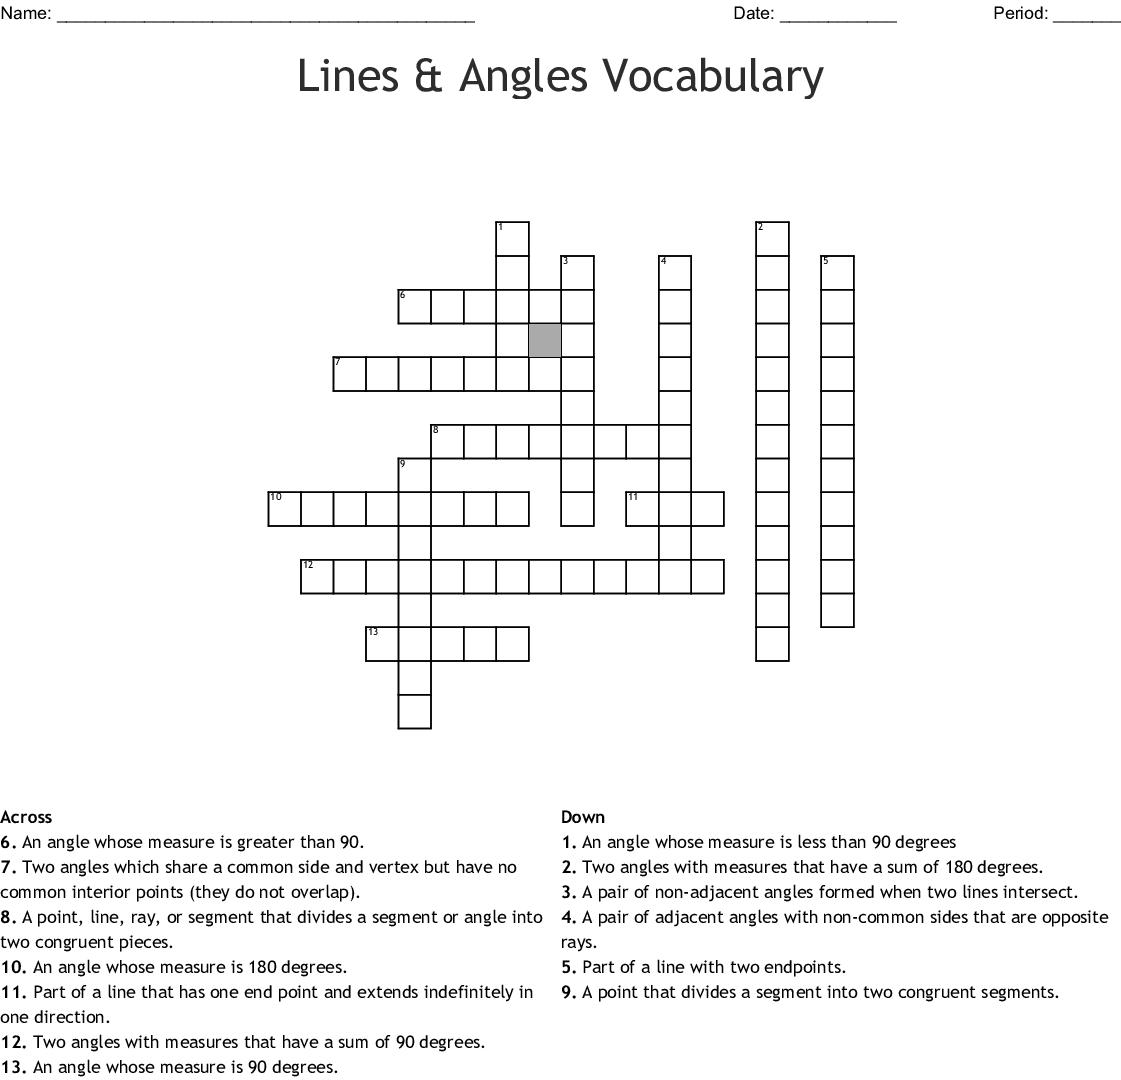 Geometry Terms Crossword